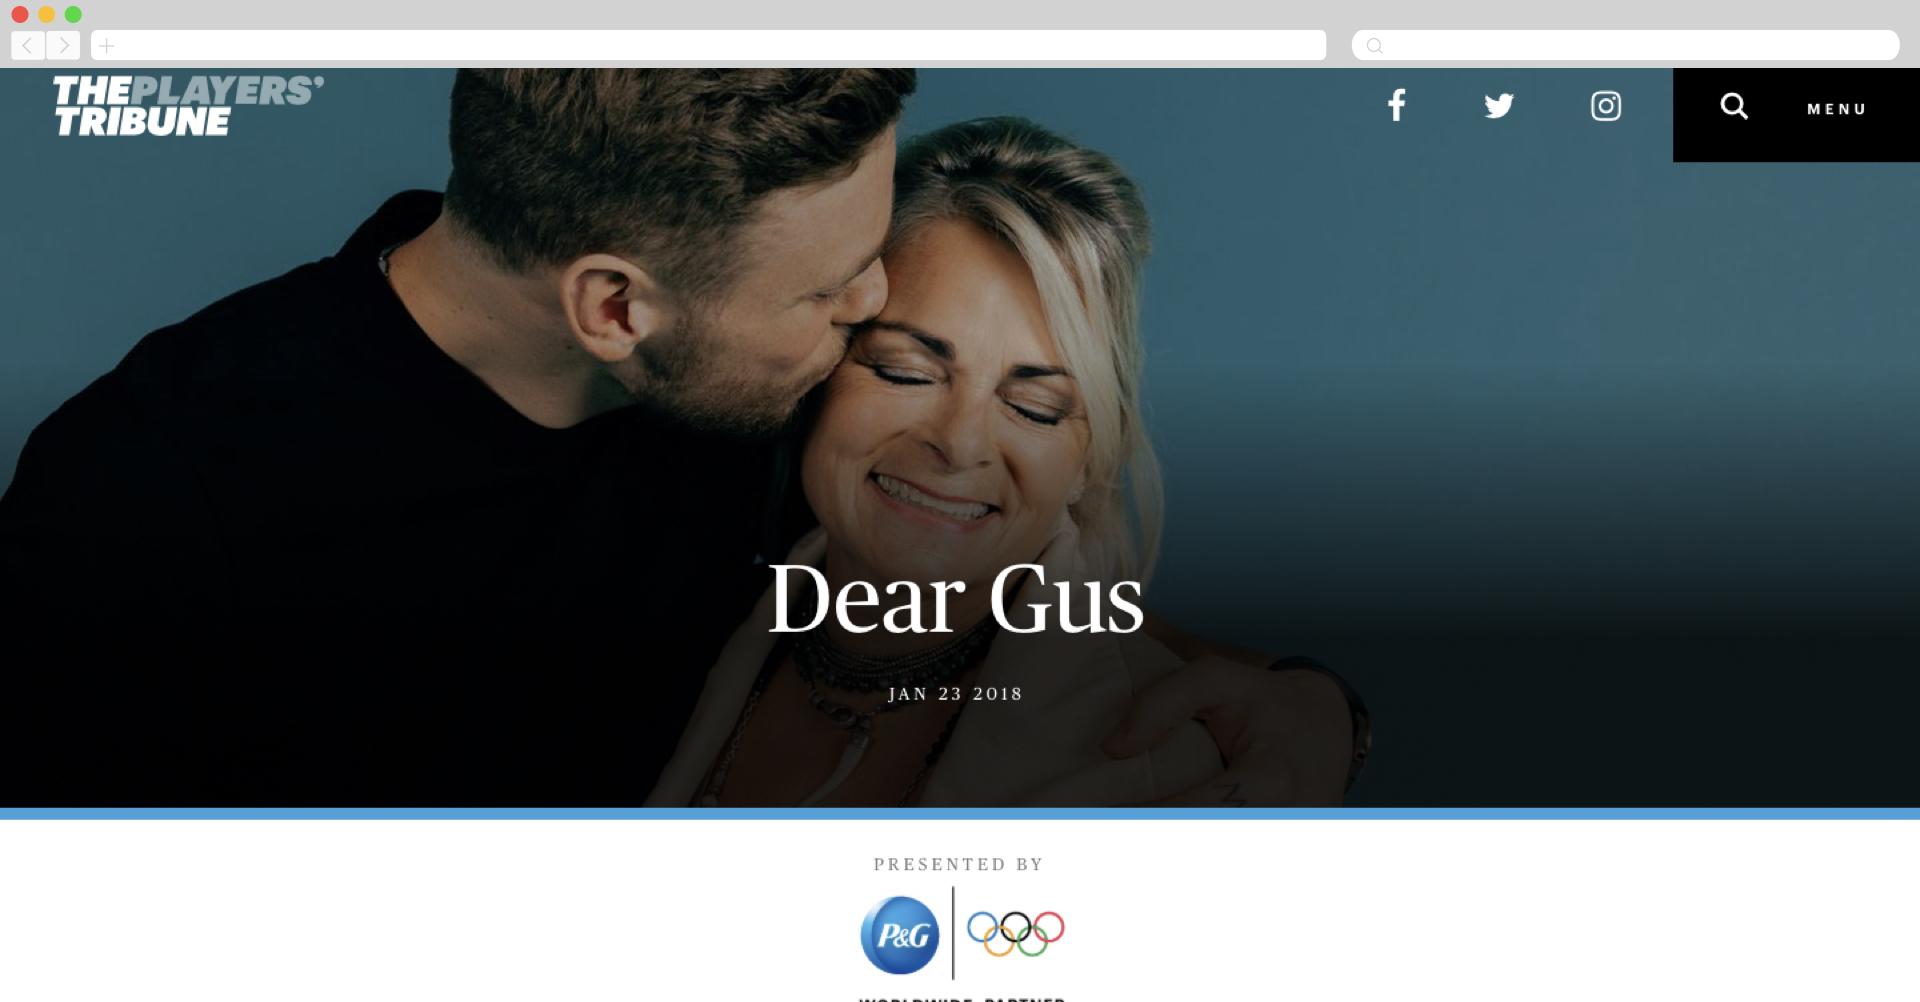 P&G campaign #loveoverbias